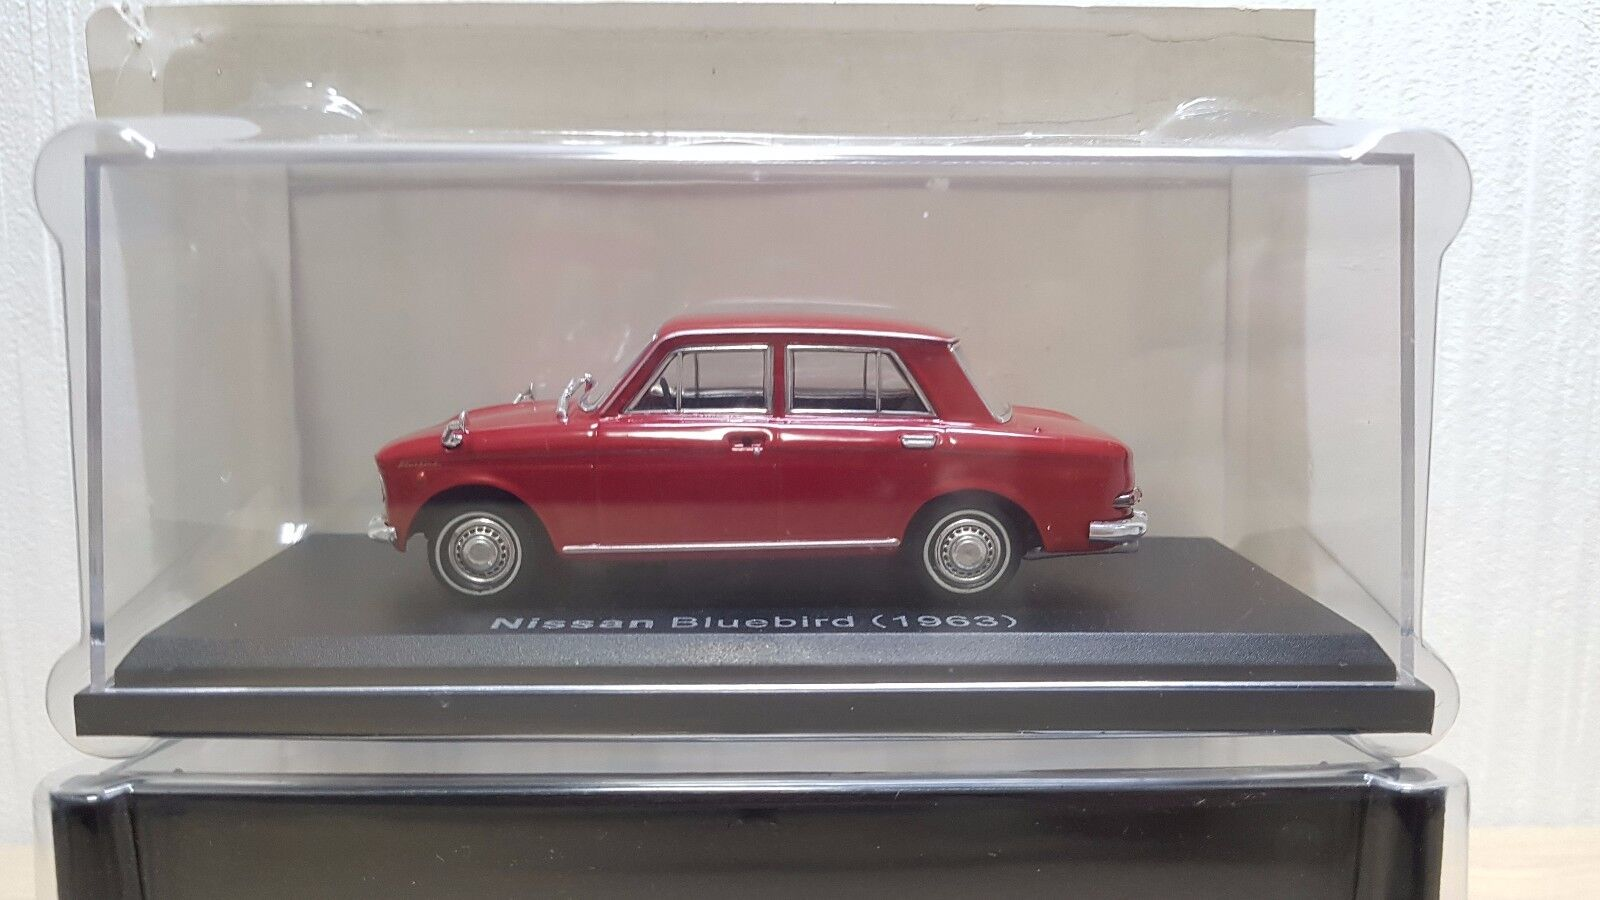 1 43 Norev 1963 Nissan Nissan Nissan azulbird rojo Diecast Modelo de Coche Nuevo b1f1ba